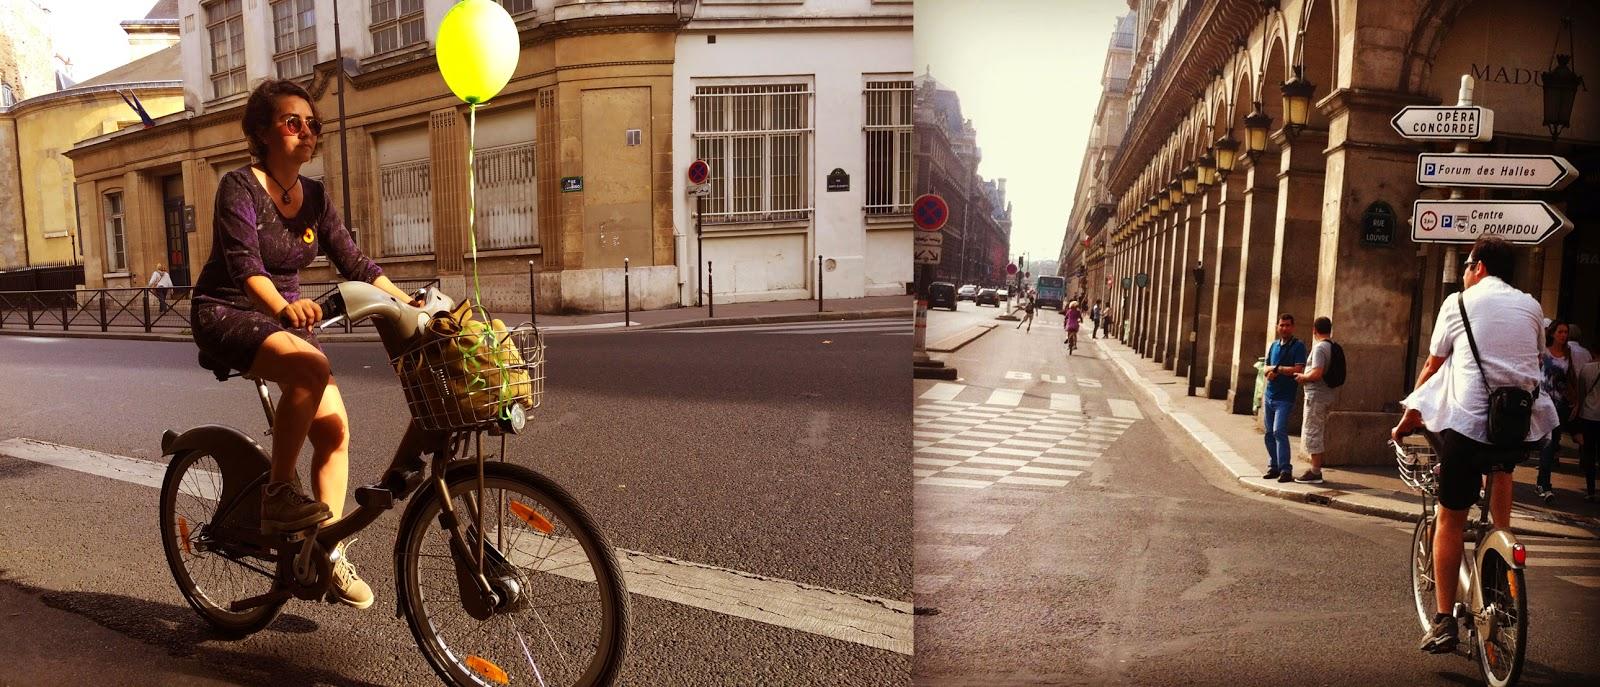 Paris Velib Bisiklet İlkbahar